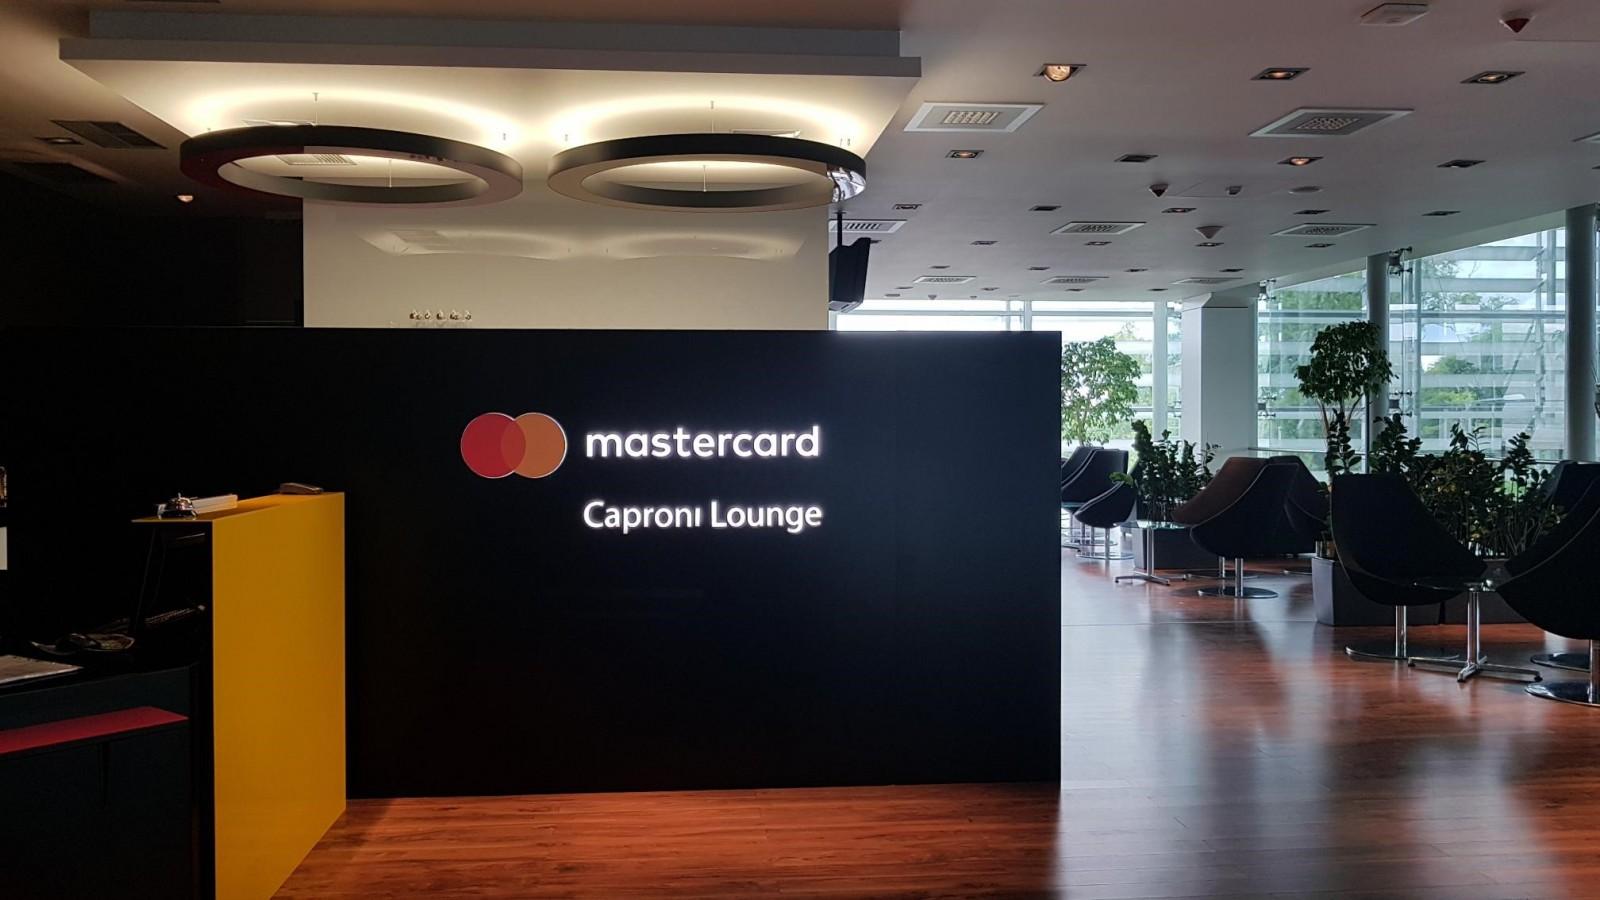 Mastercard Caproni Lounge